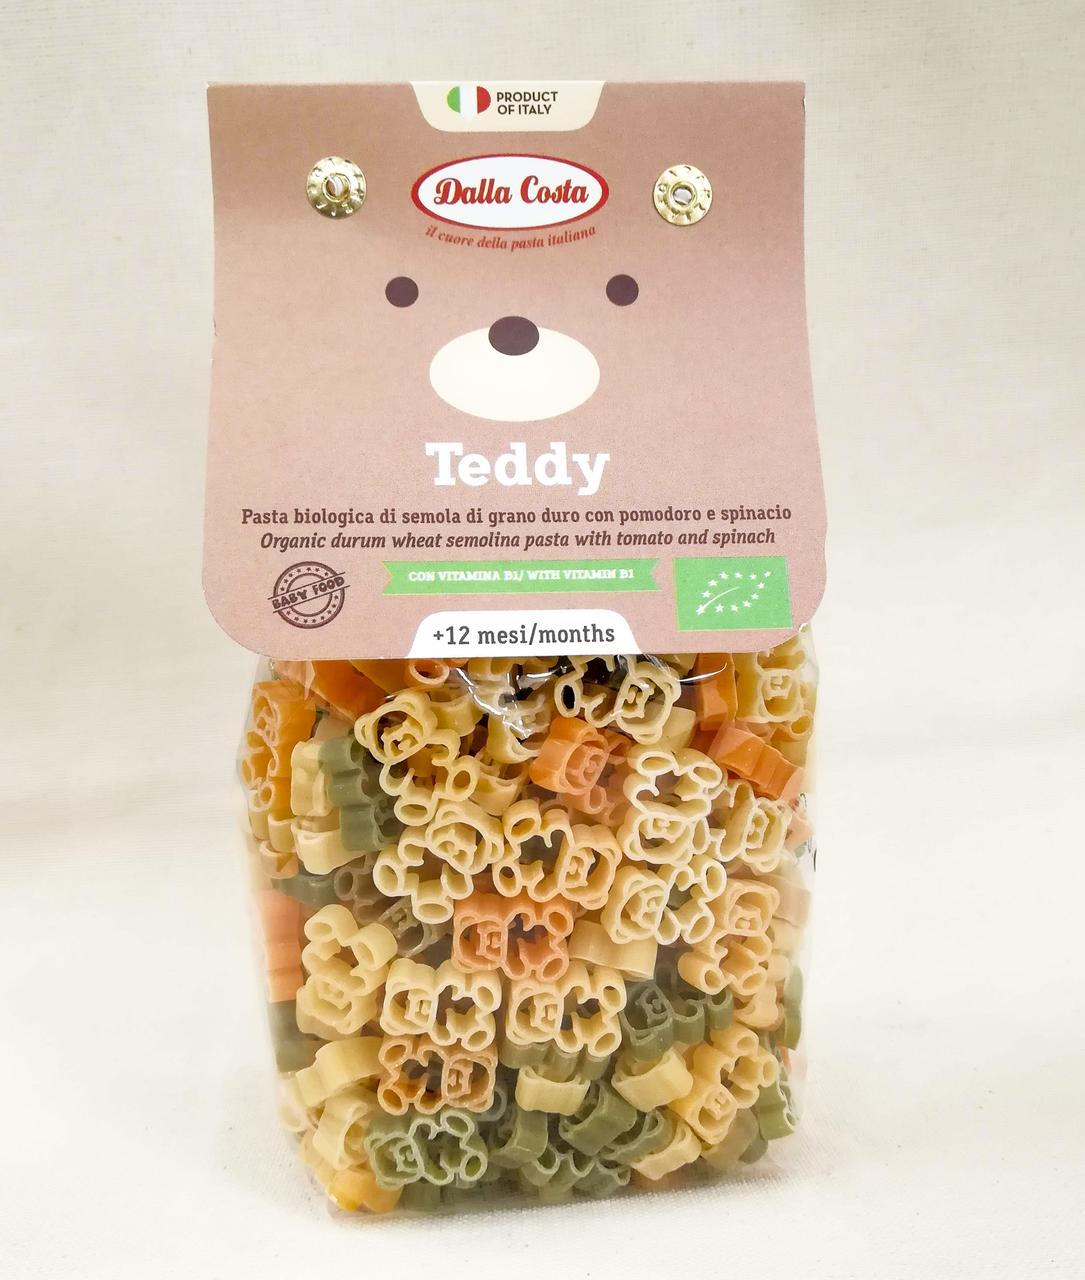 Dalla Costa Teddy макароны для детей 200 gramm